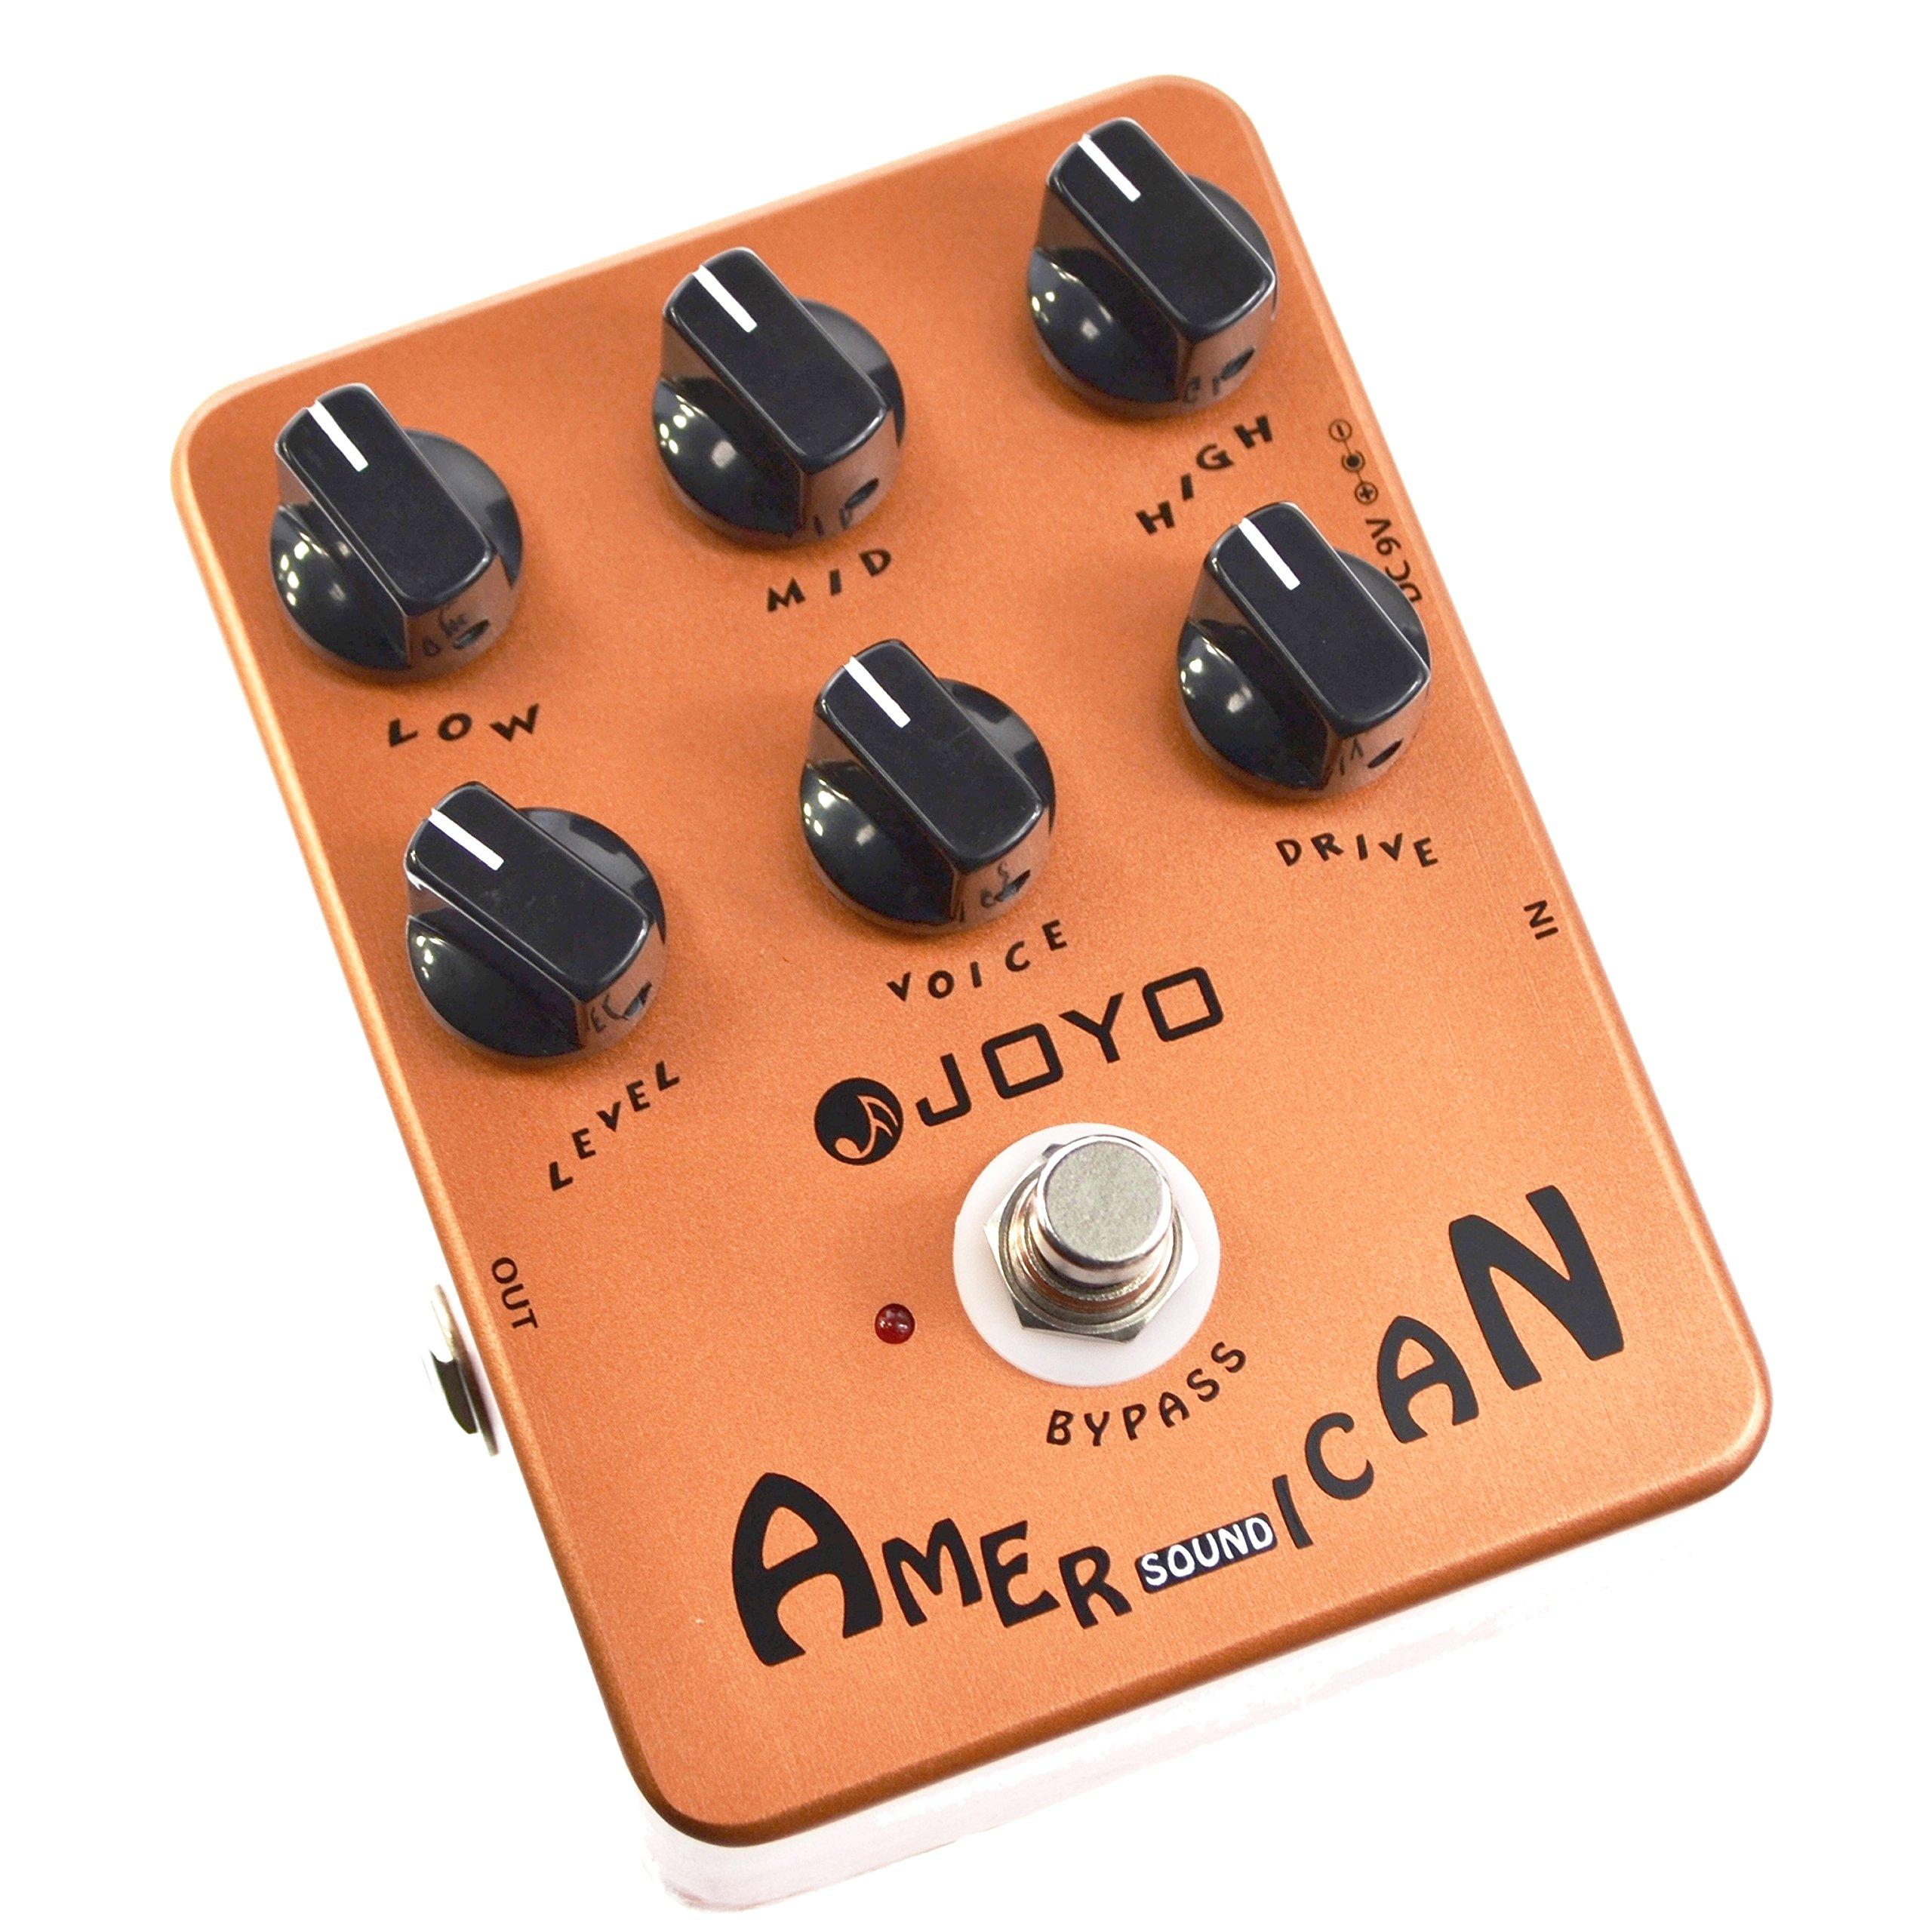 JOYO JF-14 American Sound Guitar Effect Pedal Overdrive DI Amplifier Simulator (JF-14) by MIMIDI